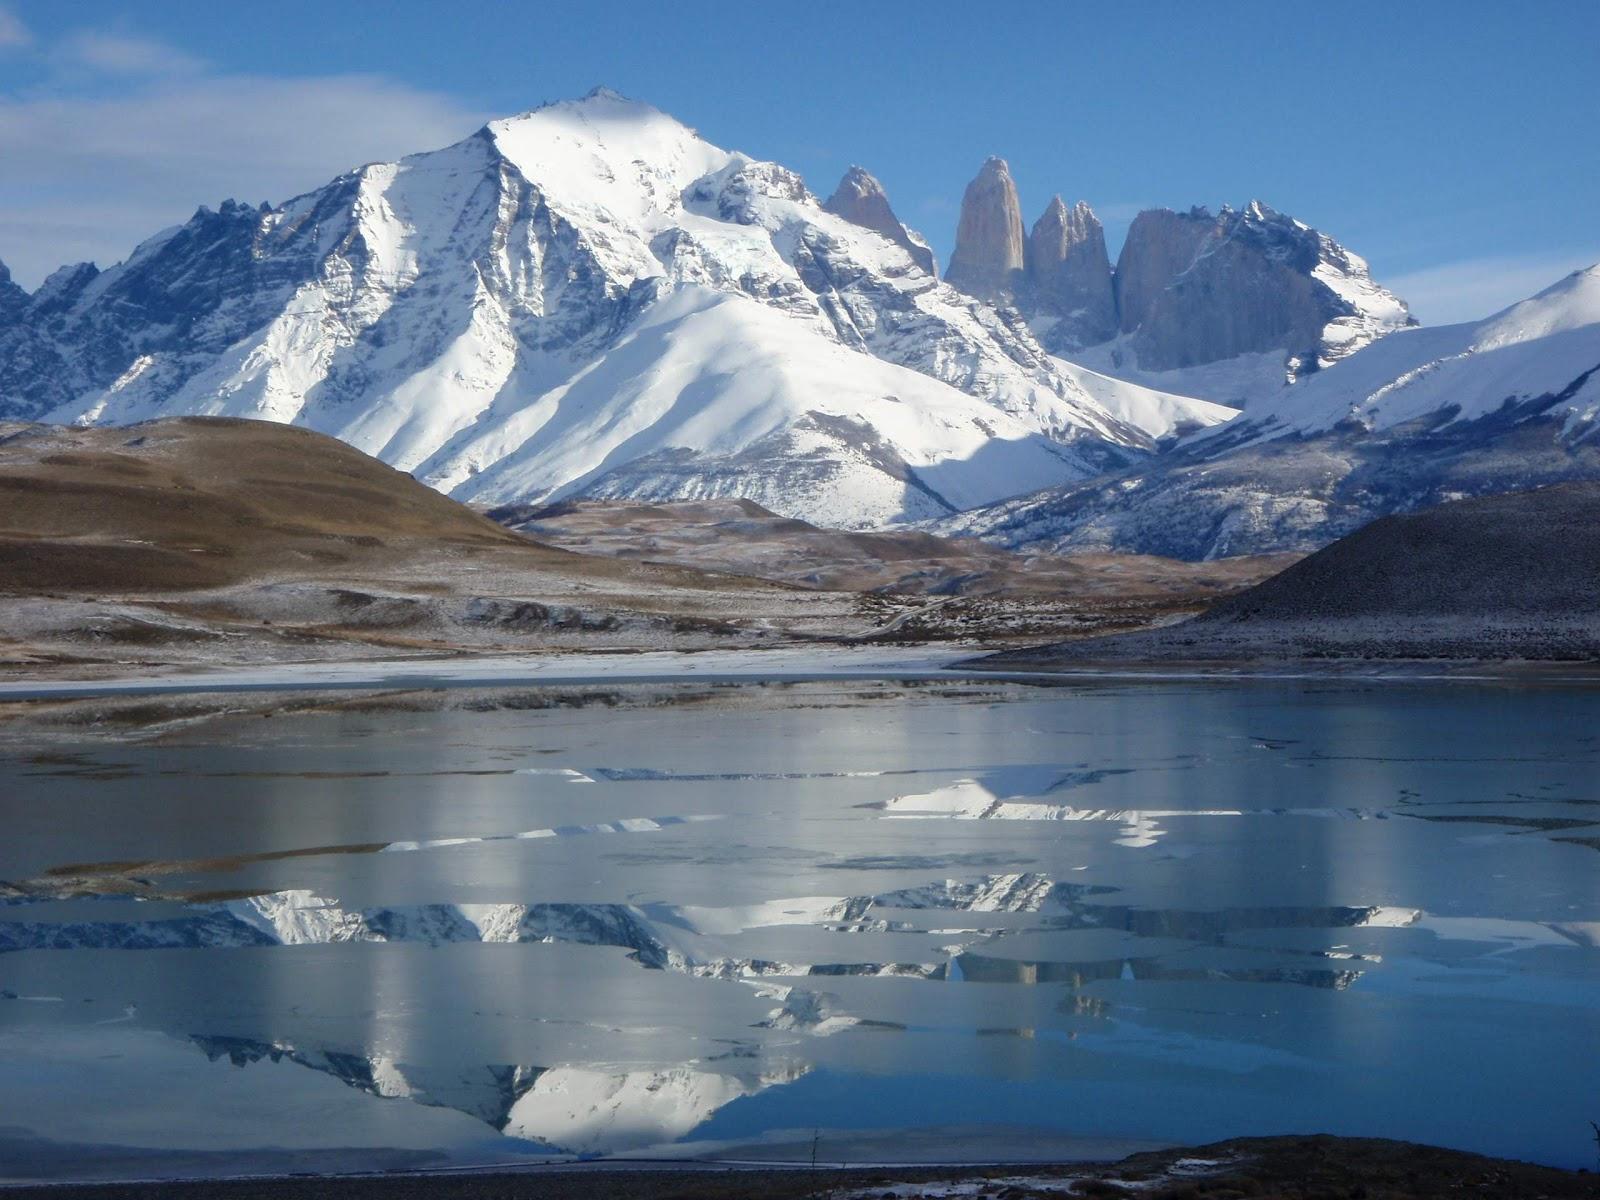 http://2.bp.blogspot.com/-1kXAGwihy4U/UCafsFjuvfI/AAAAAAAAErw/8qKOfCCohBU/s1600/torres-del-paine-chile-p.jpg